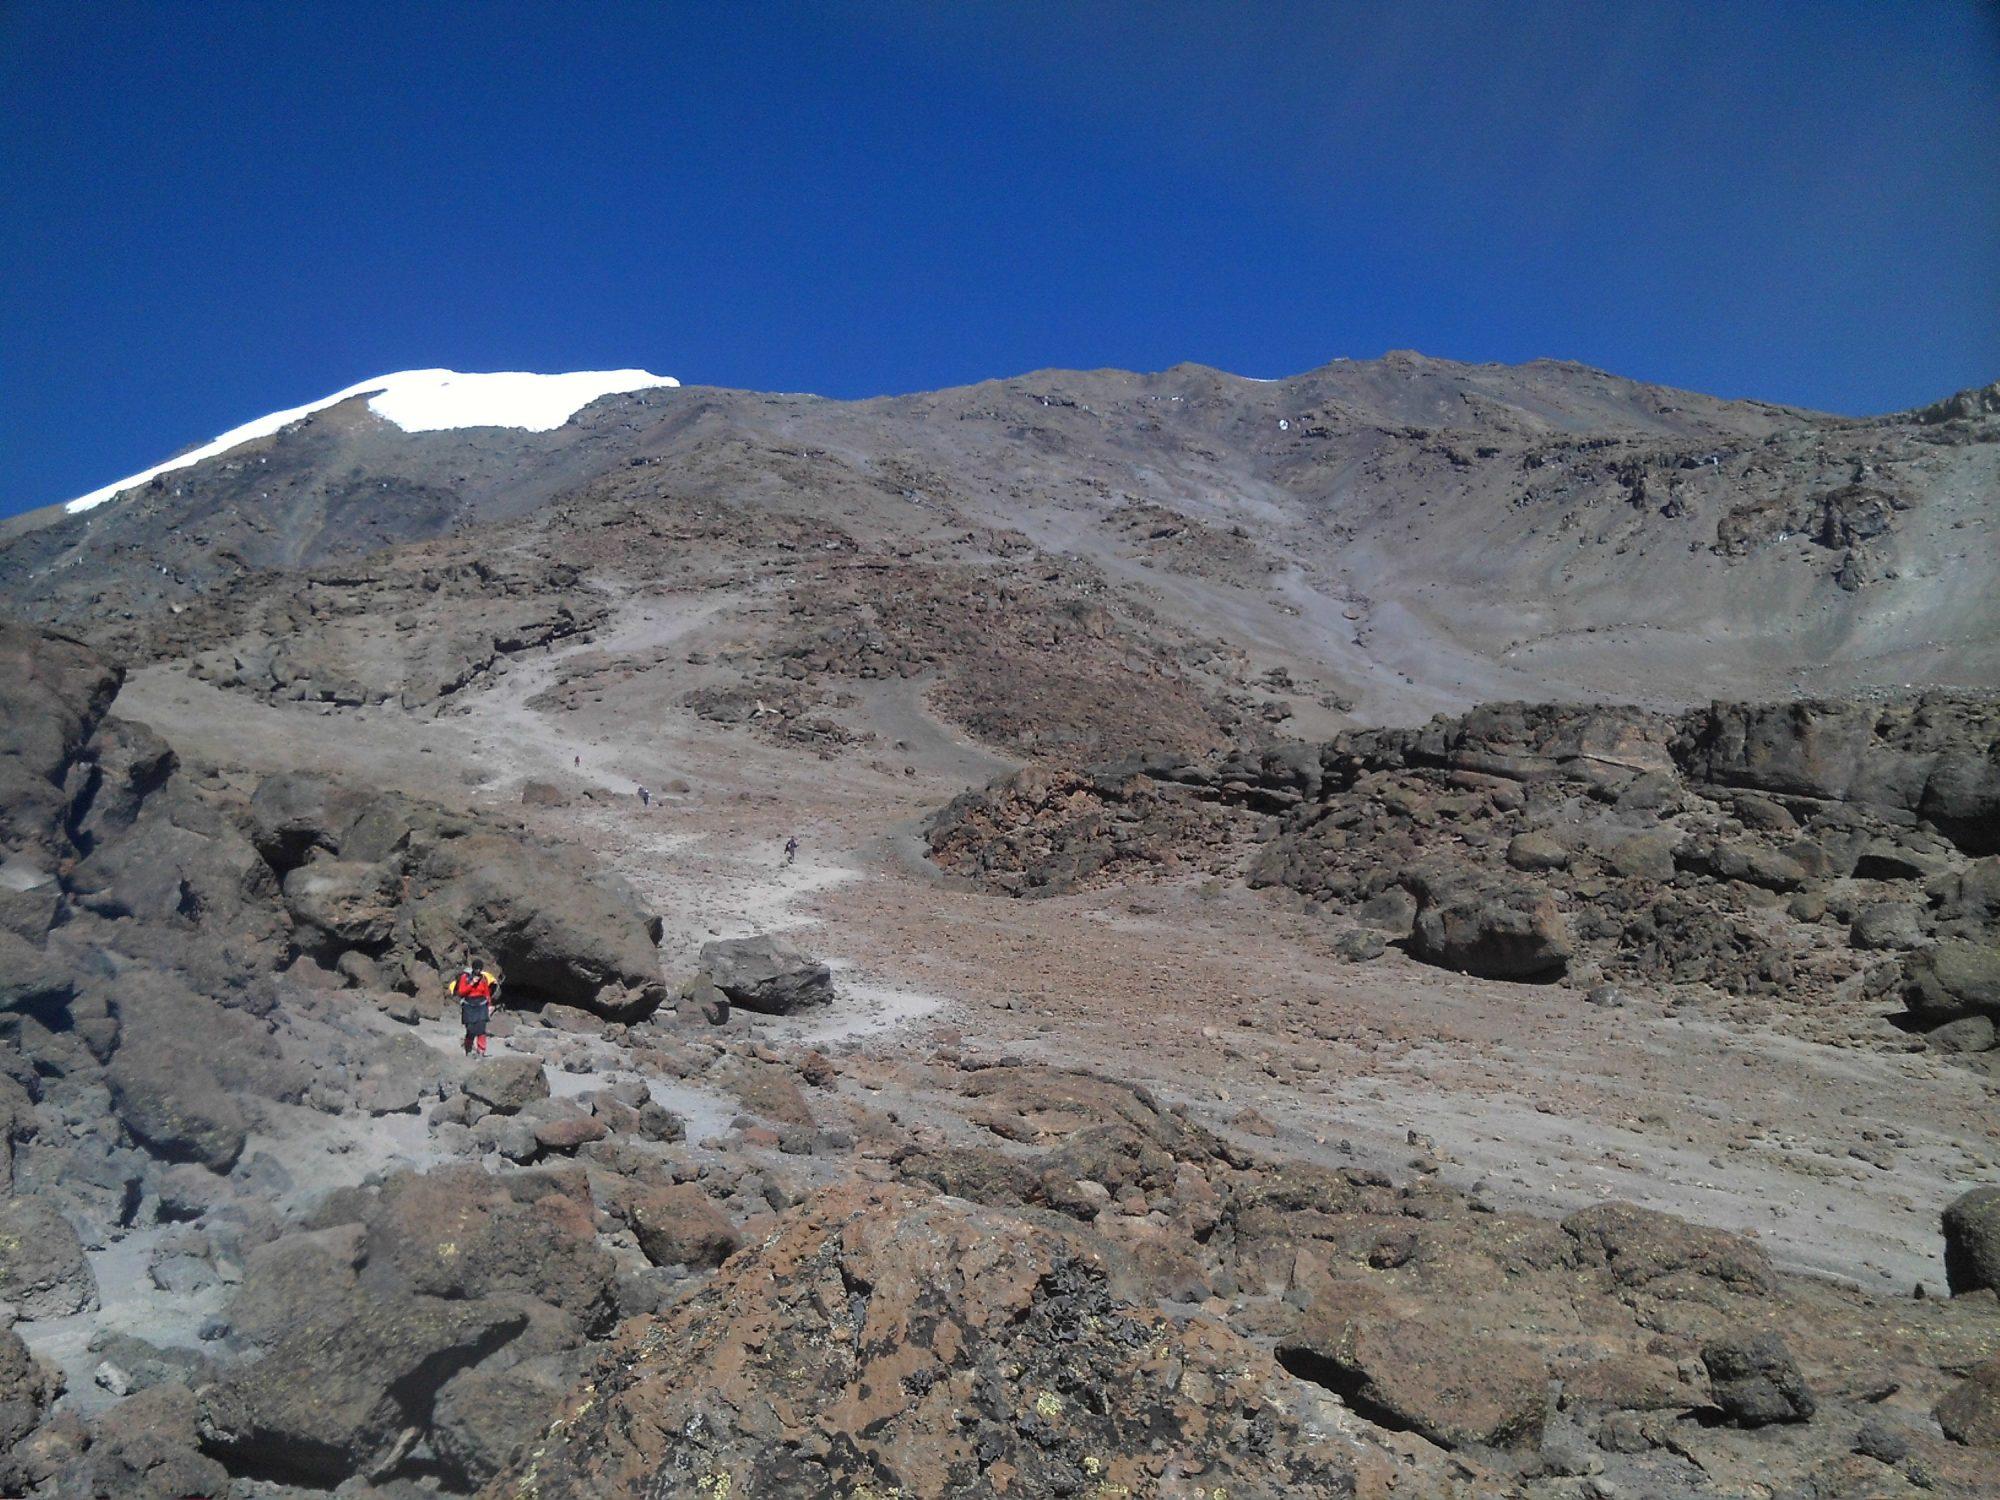 Weg auf den Kilimandscharo, Kilimandscharo besteigen, Tansania, Afrika, Kilimandscharo Tour, Erfahrungsbericht, Machame Route